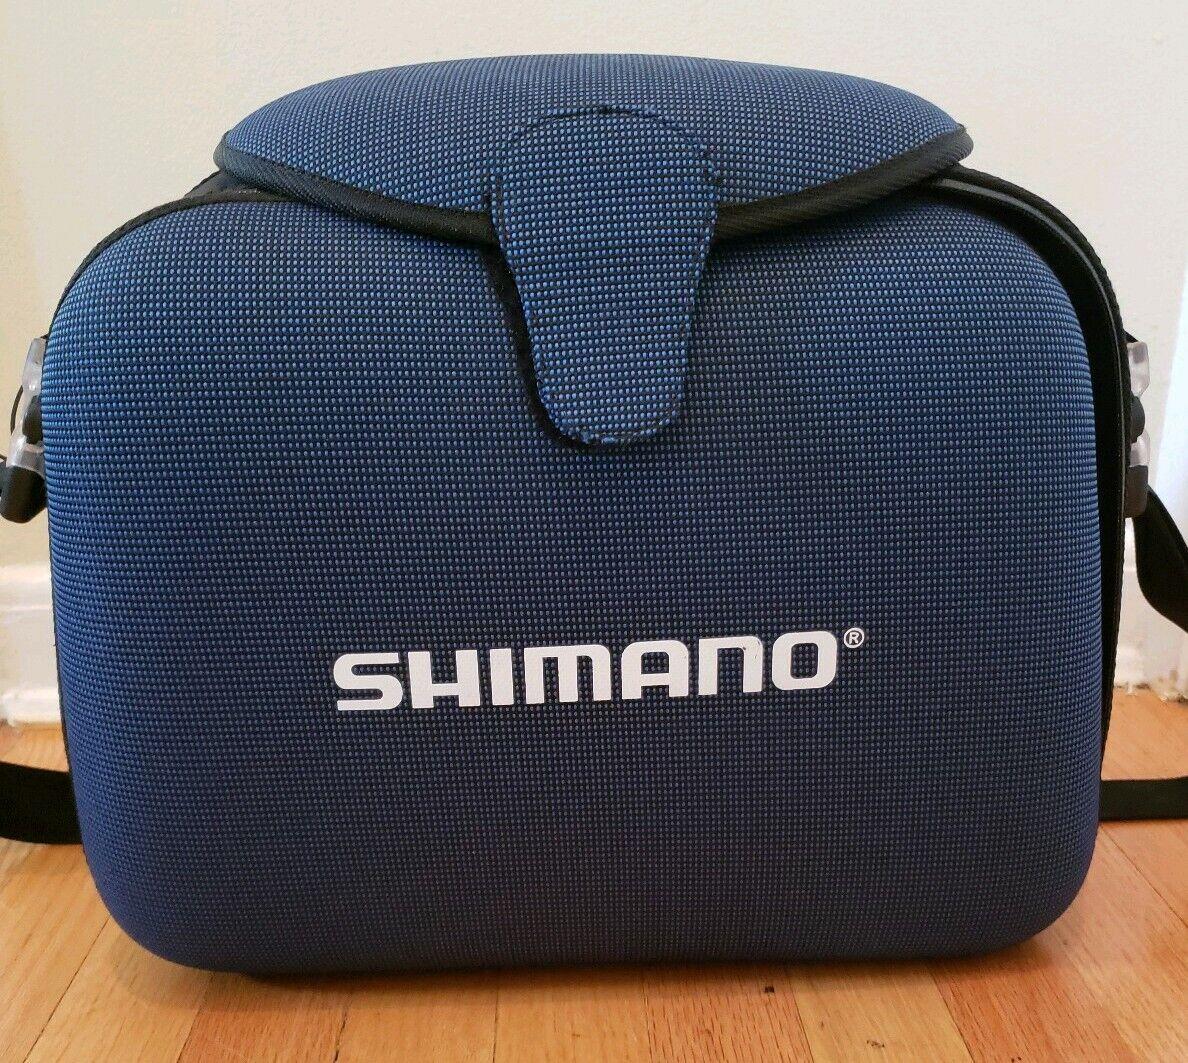 Shimano laars   Tackle Zak blauw